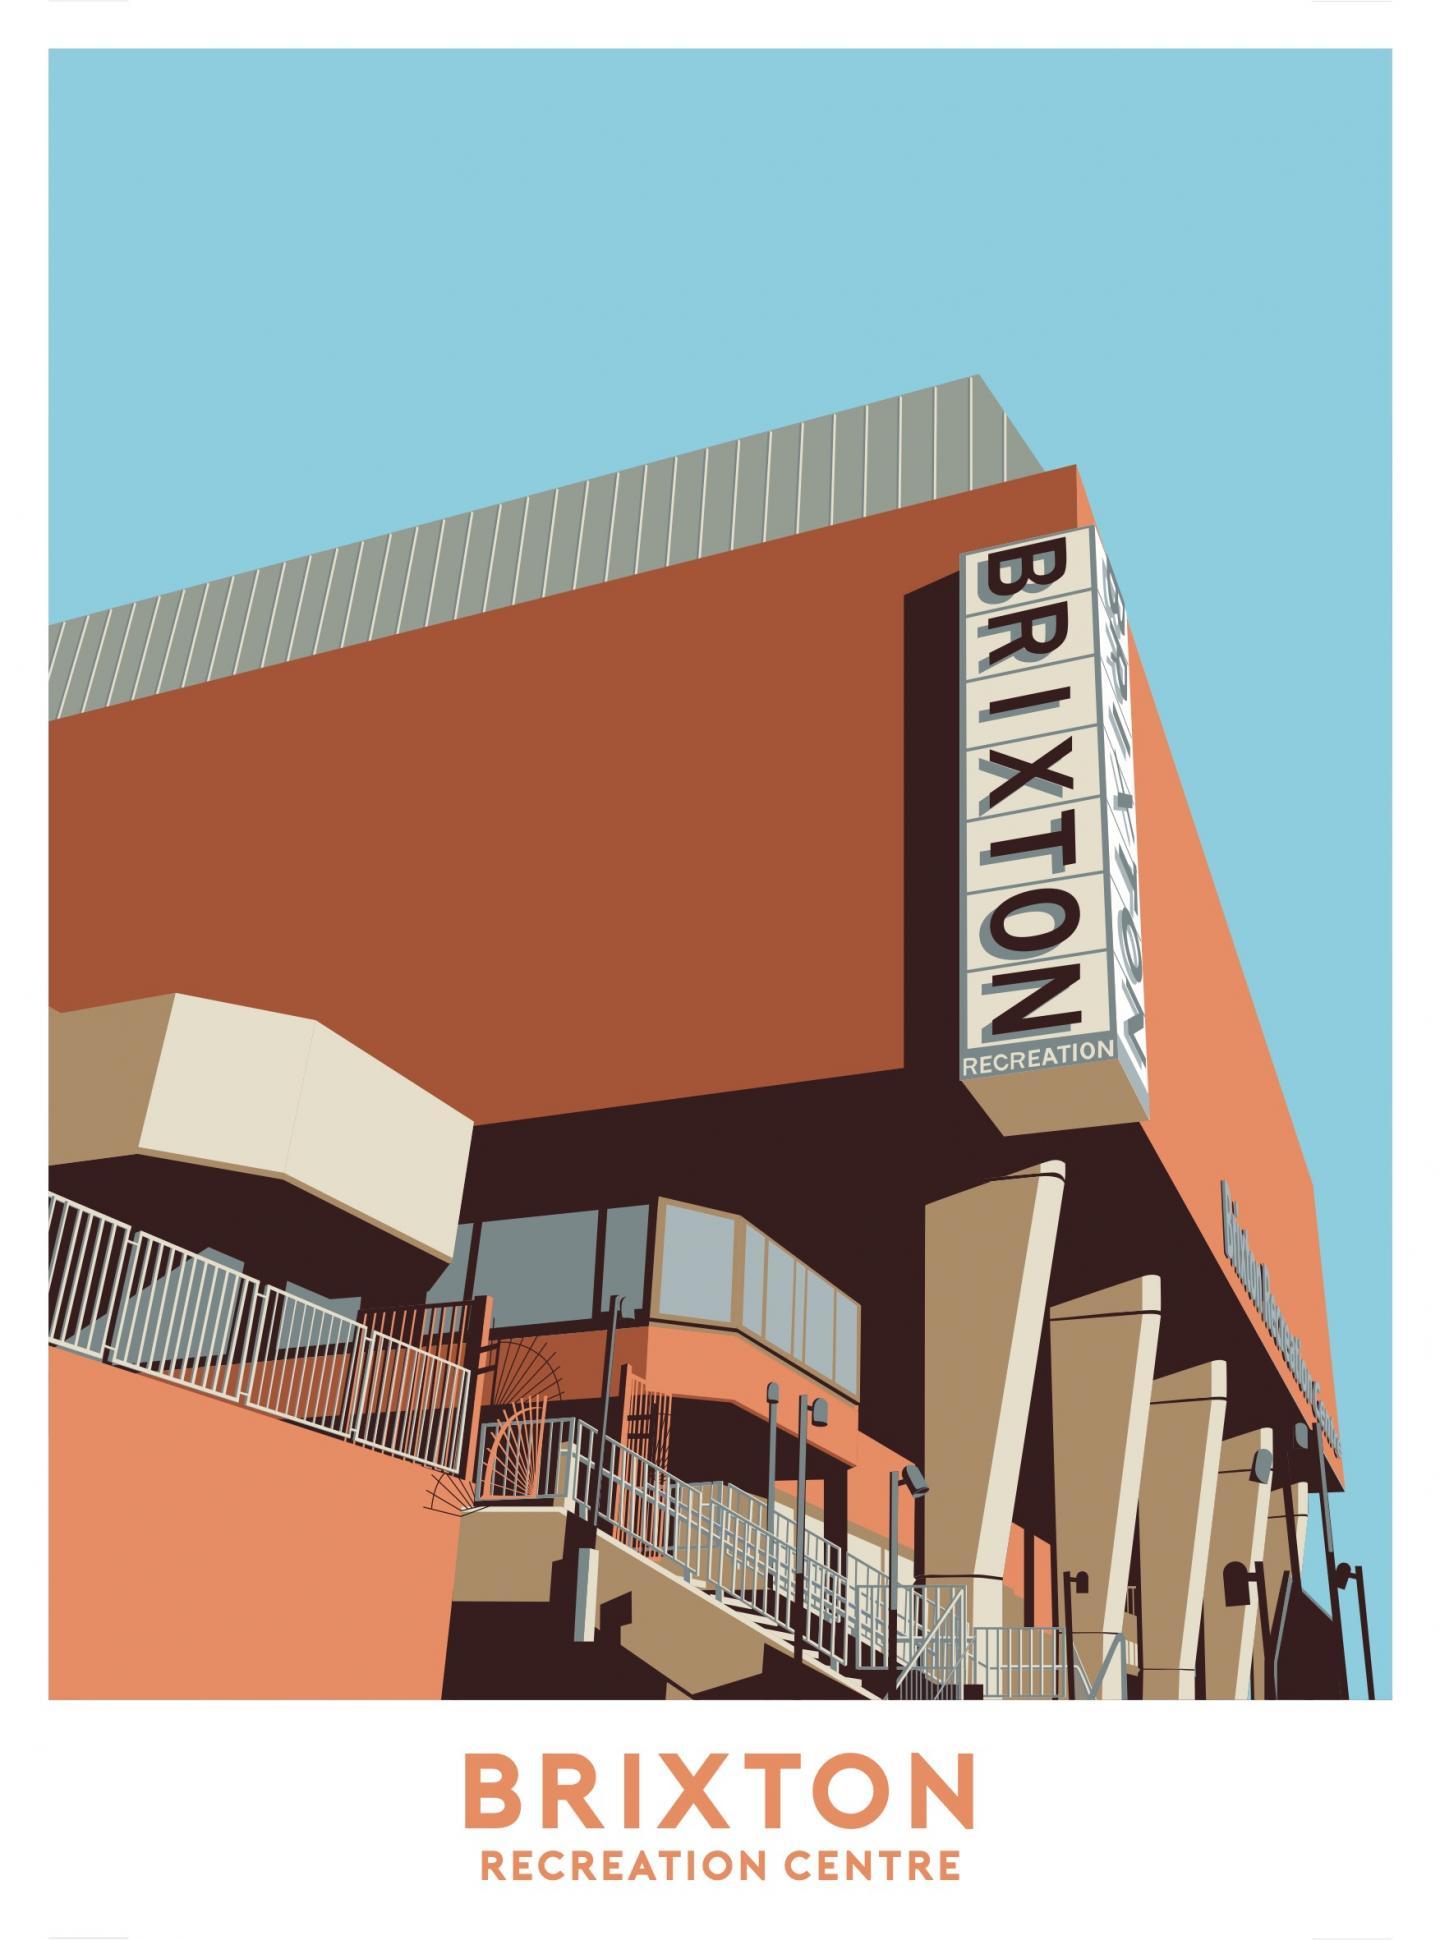 Place in Print Brixton Recreation Centre Rec Travel Poster Art Print